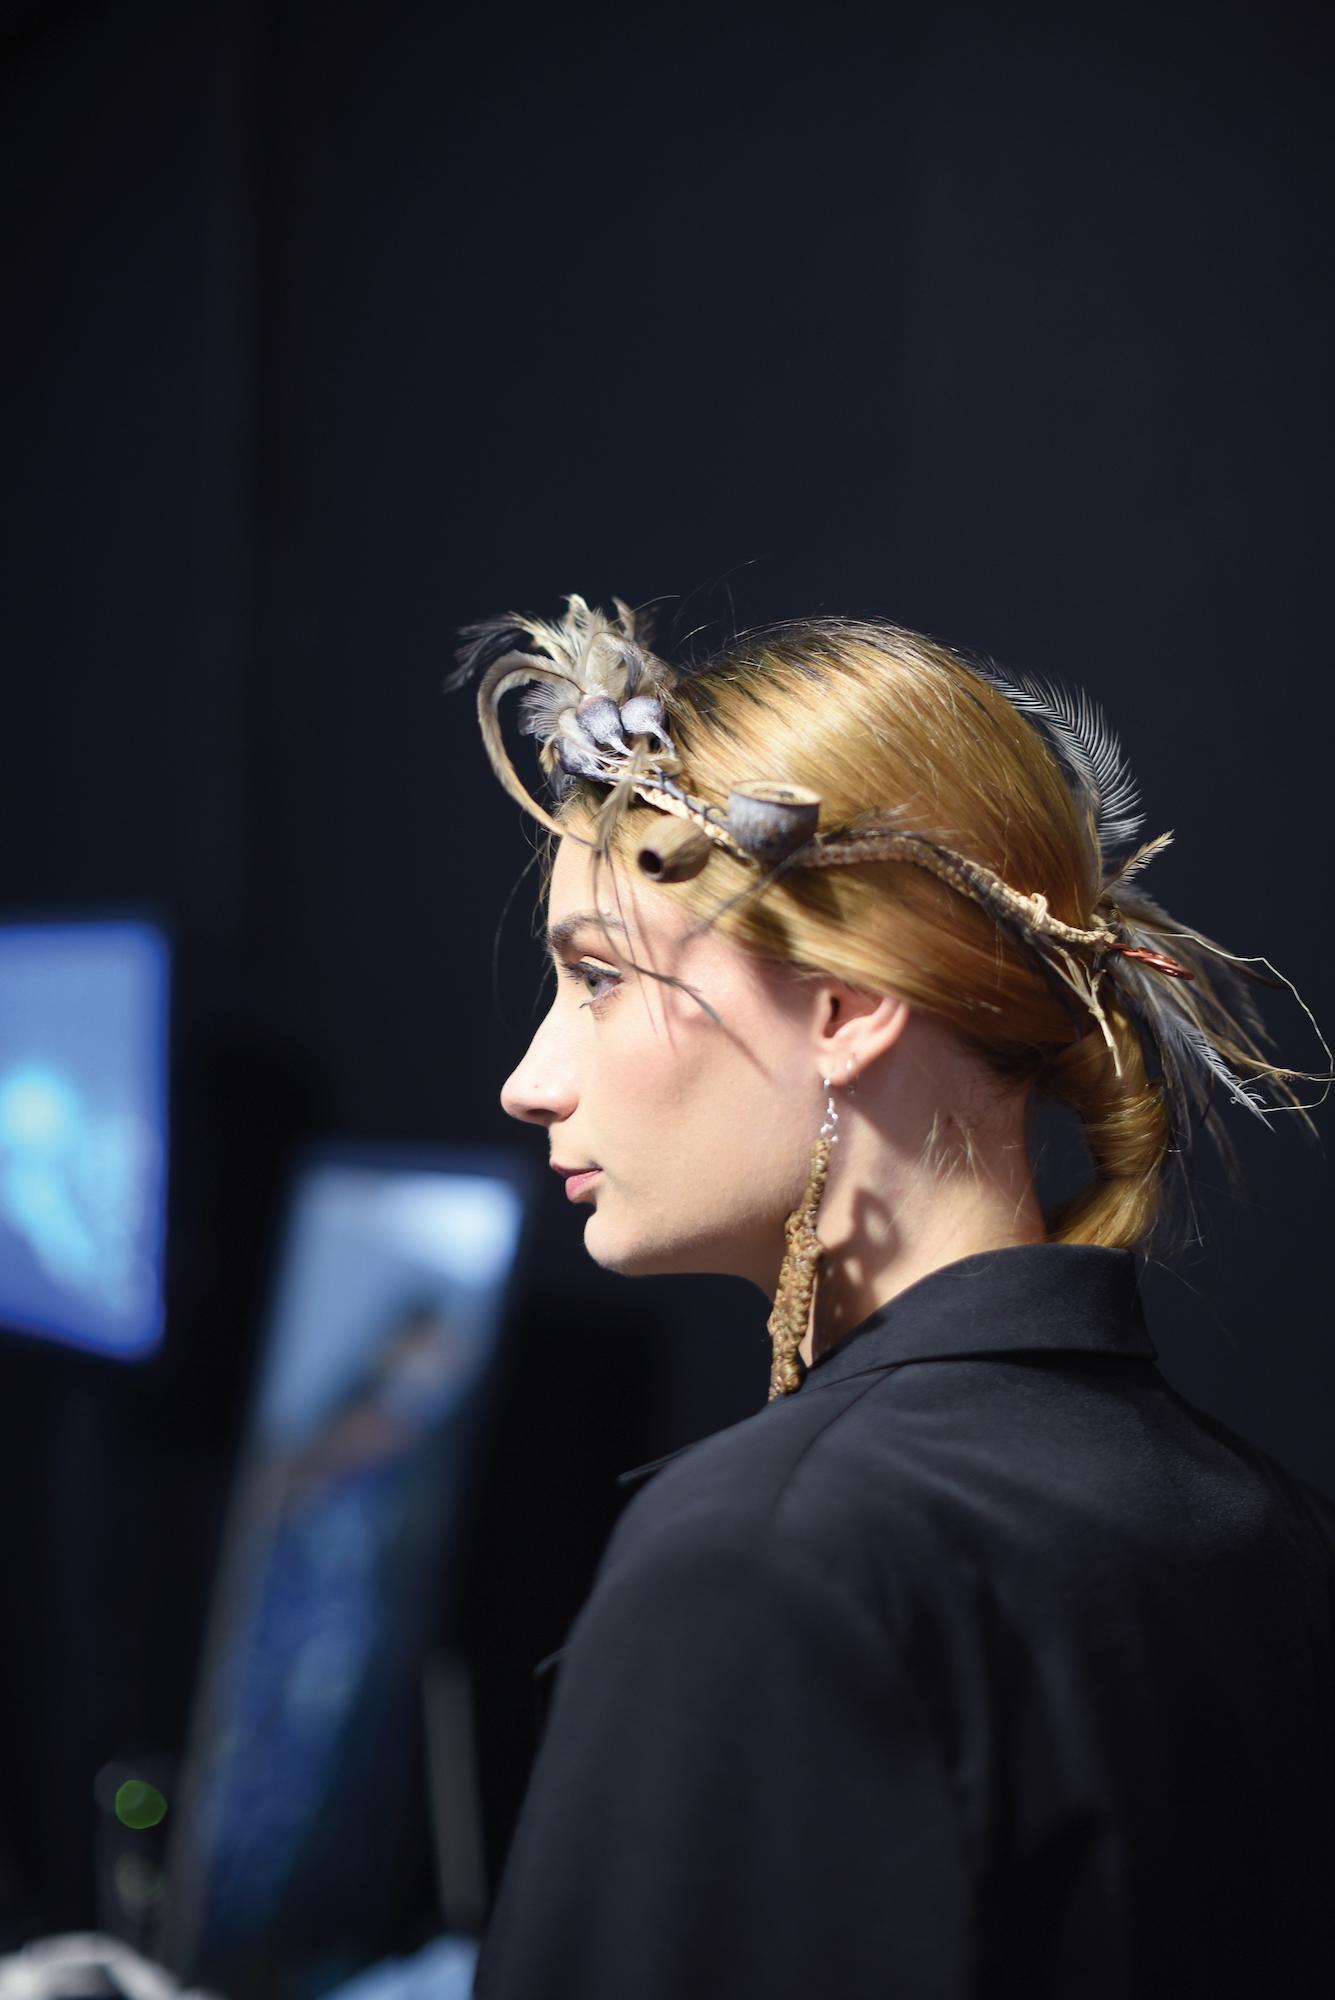 Wanita kaukasia dengan rambut pirang dan model rambut knotted sleek – Jakarta Fashion Week 2019